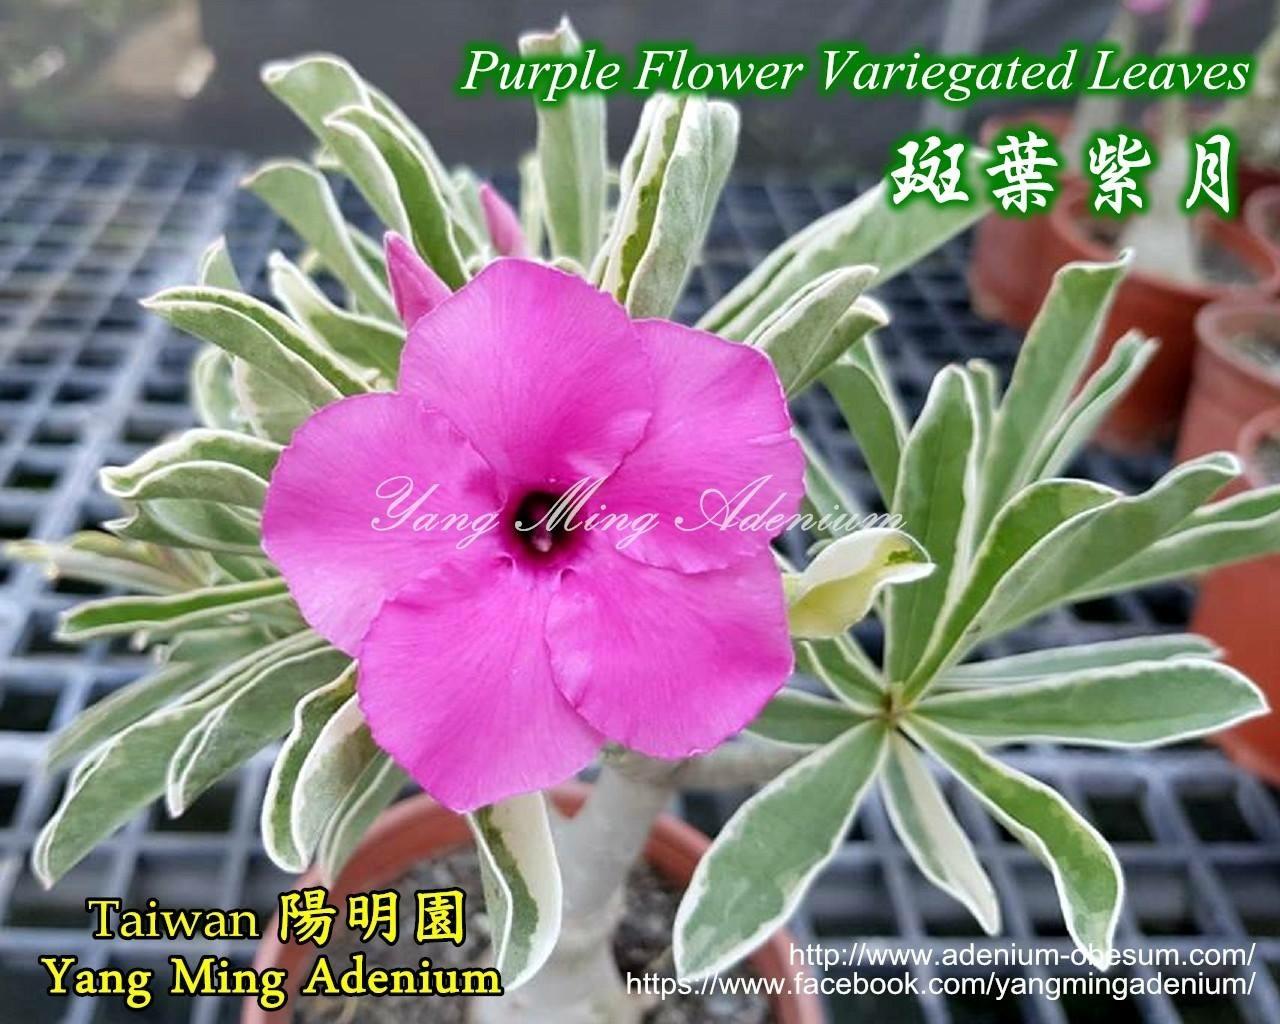 Прививка Swazicum Variegated Leaves Purple Flower